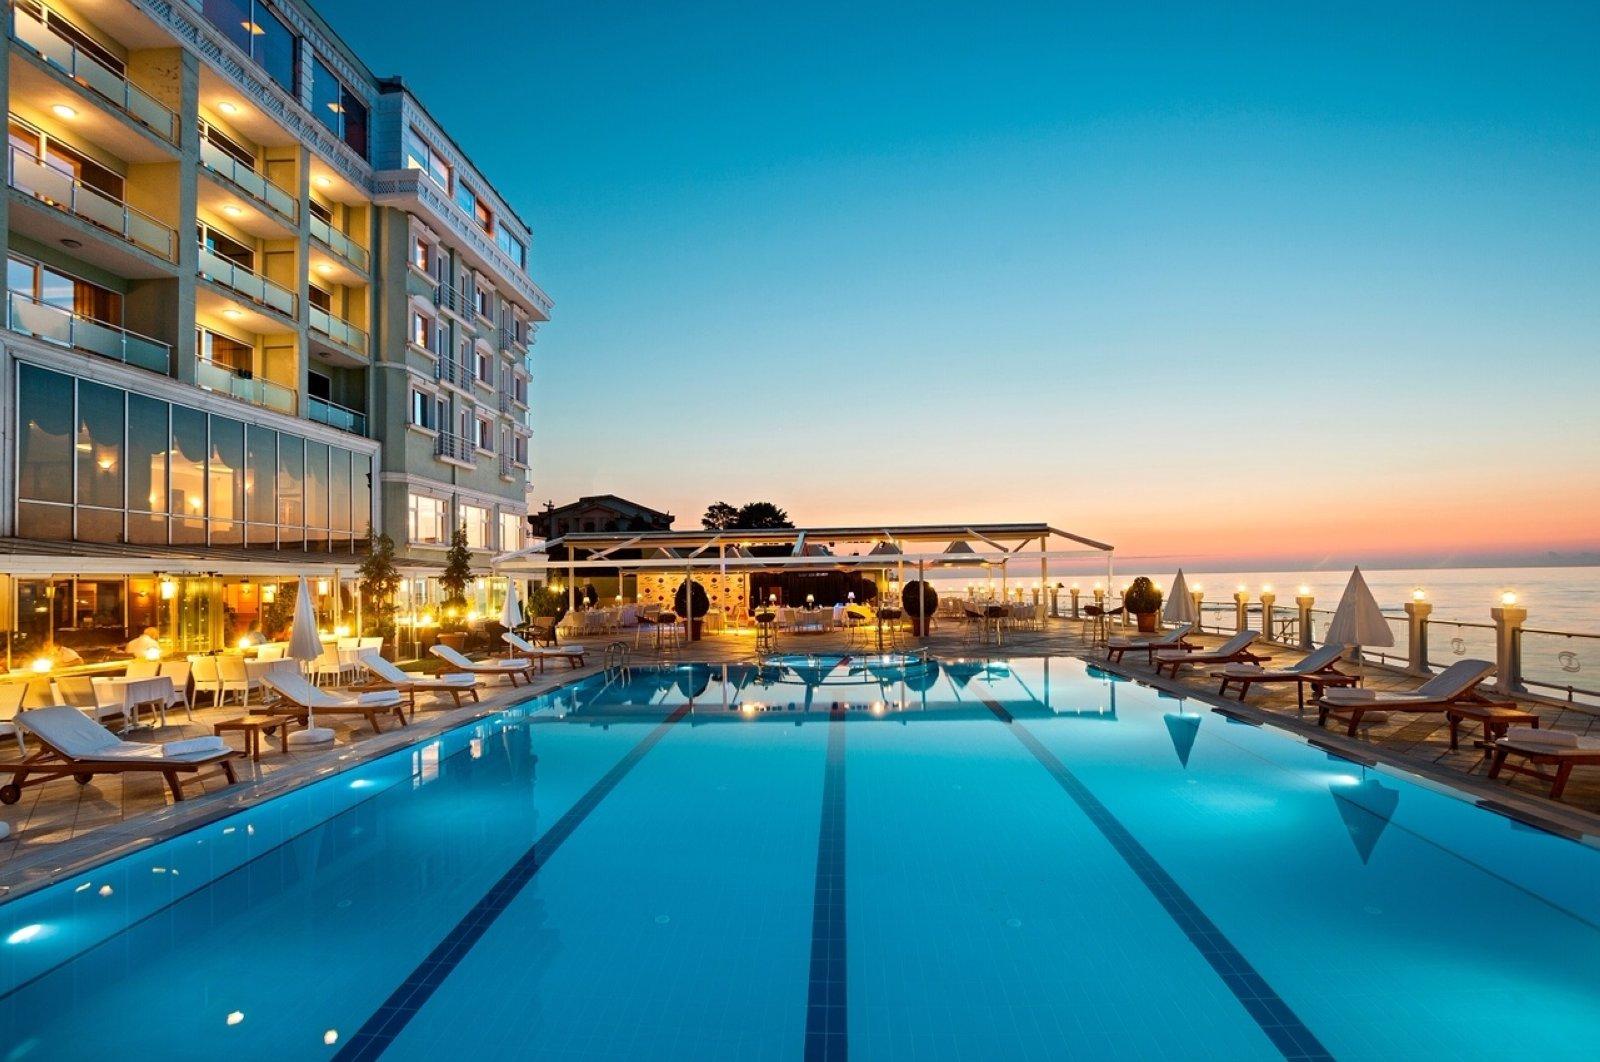 The La Quinta by Wyndham hotel in the northern Giresun province, Turkey. (Photo courtesy of Wyndham)